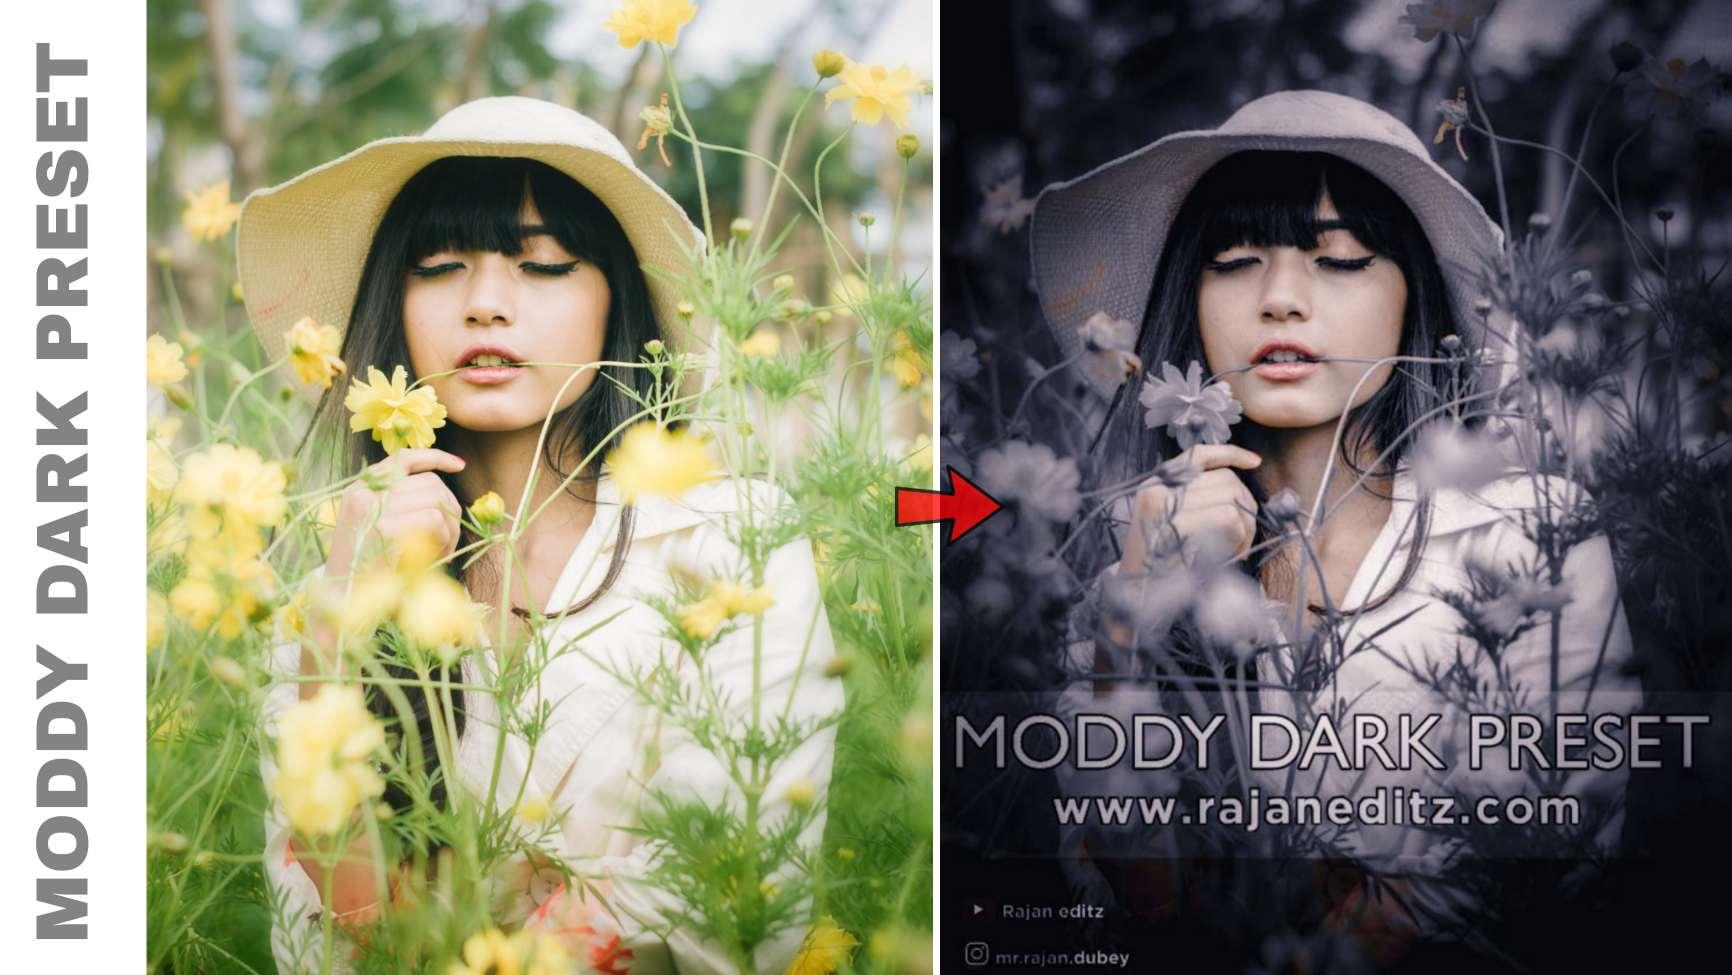 Moddy Dark Preset __ lightroom black tone preset download free